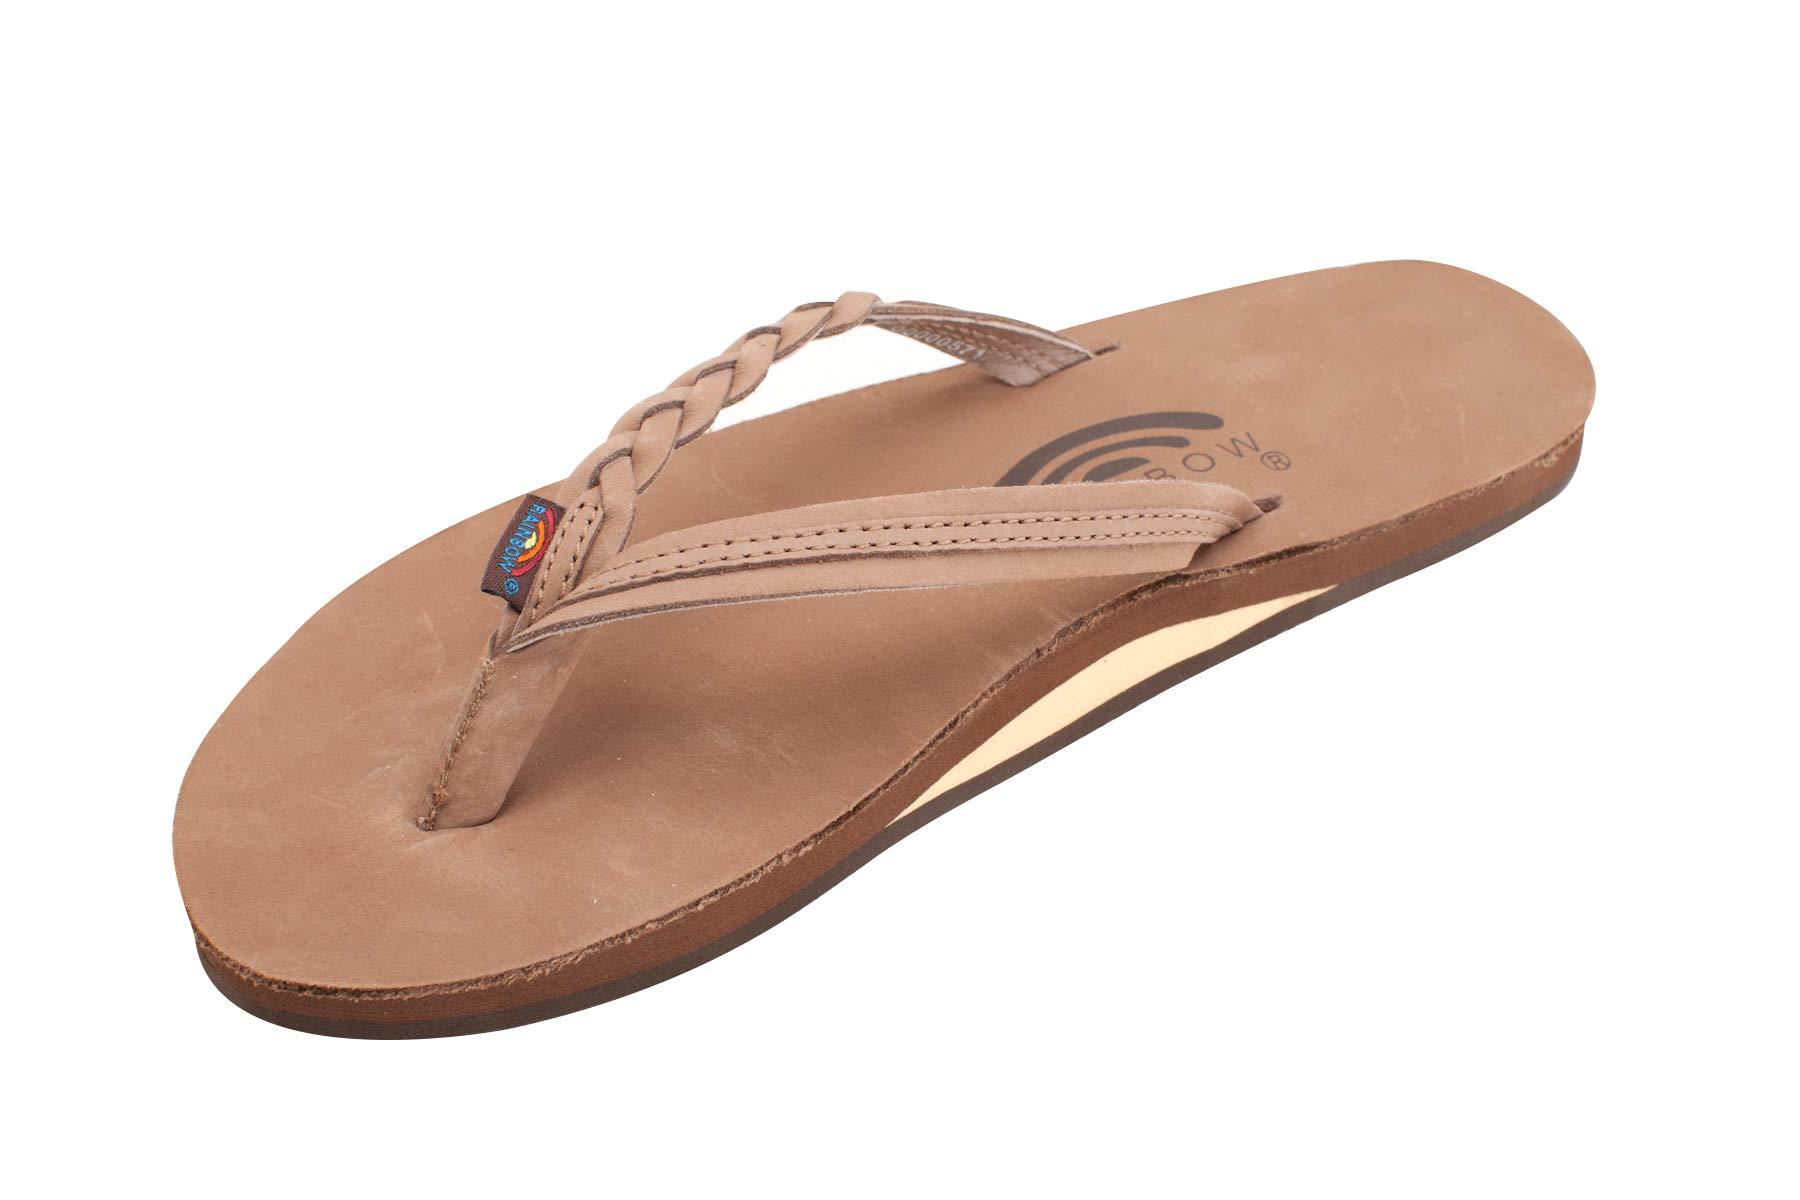 Rainbow Women's Flirty Braidy Dark Brown Sandals - Large 7.5-8.5 B(M) US by Rainbow Sandals